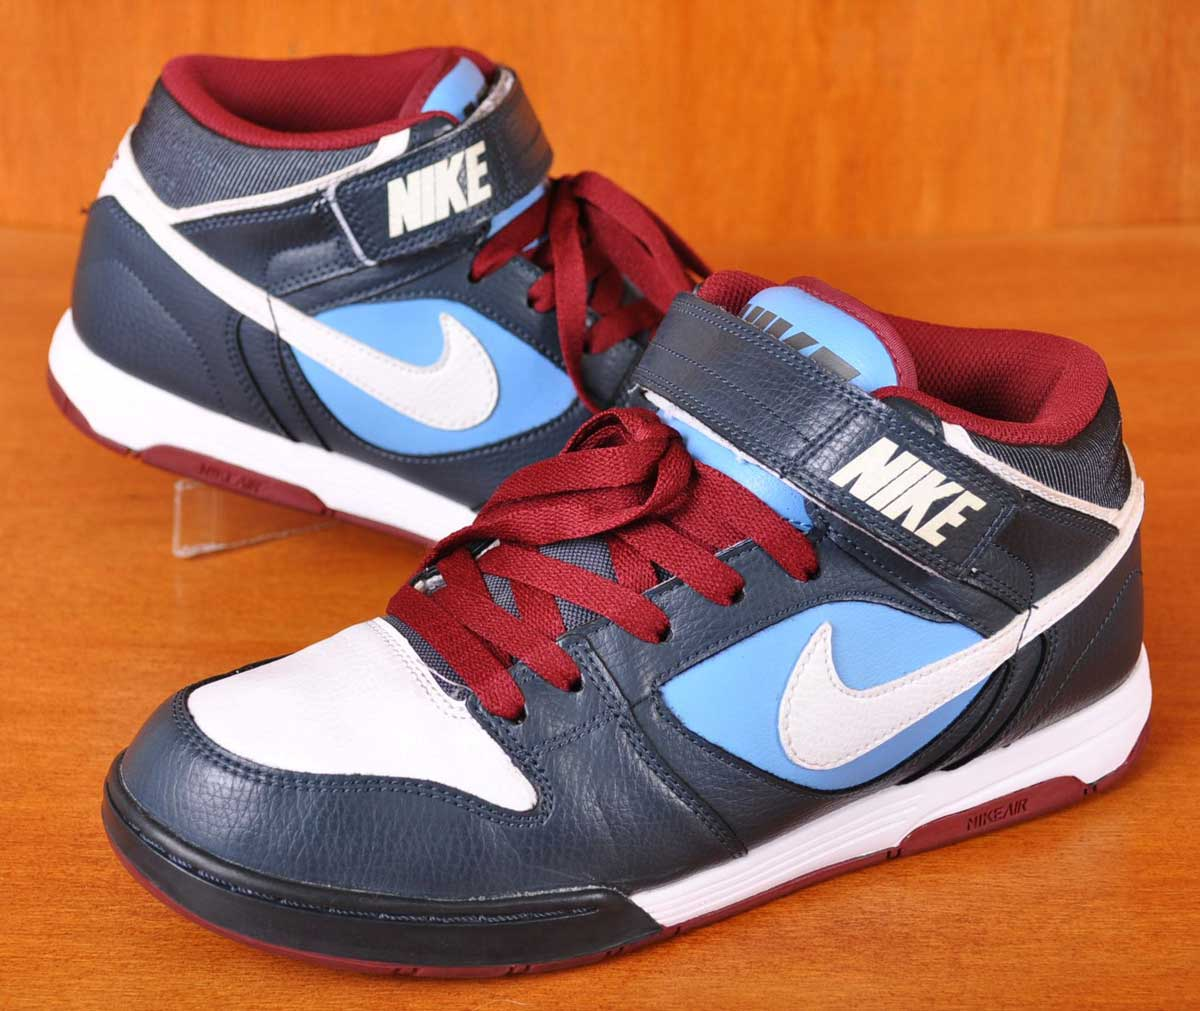 2010-year NIKE Nike   AIR TWILIGHT MID air twilight mid   mid cut skate  shoes   Navy x white light blue   JPN27.0cm  067720f6a026